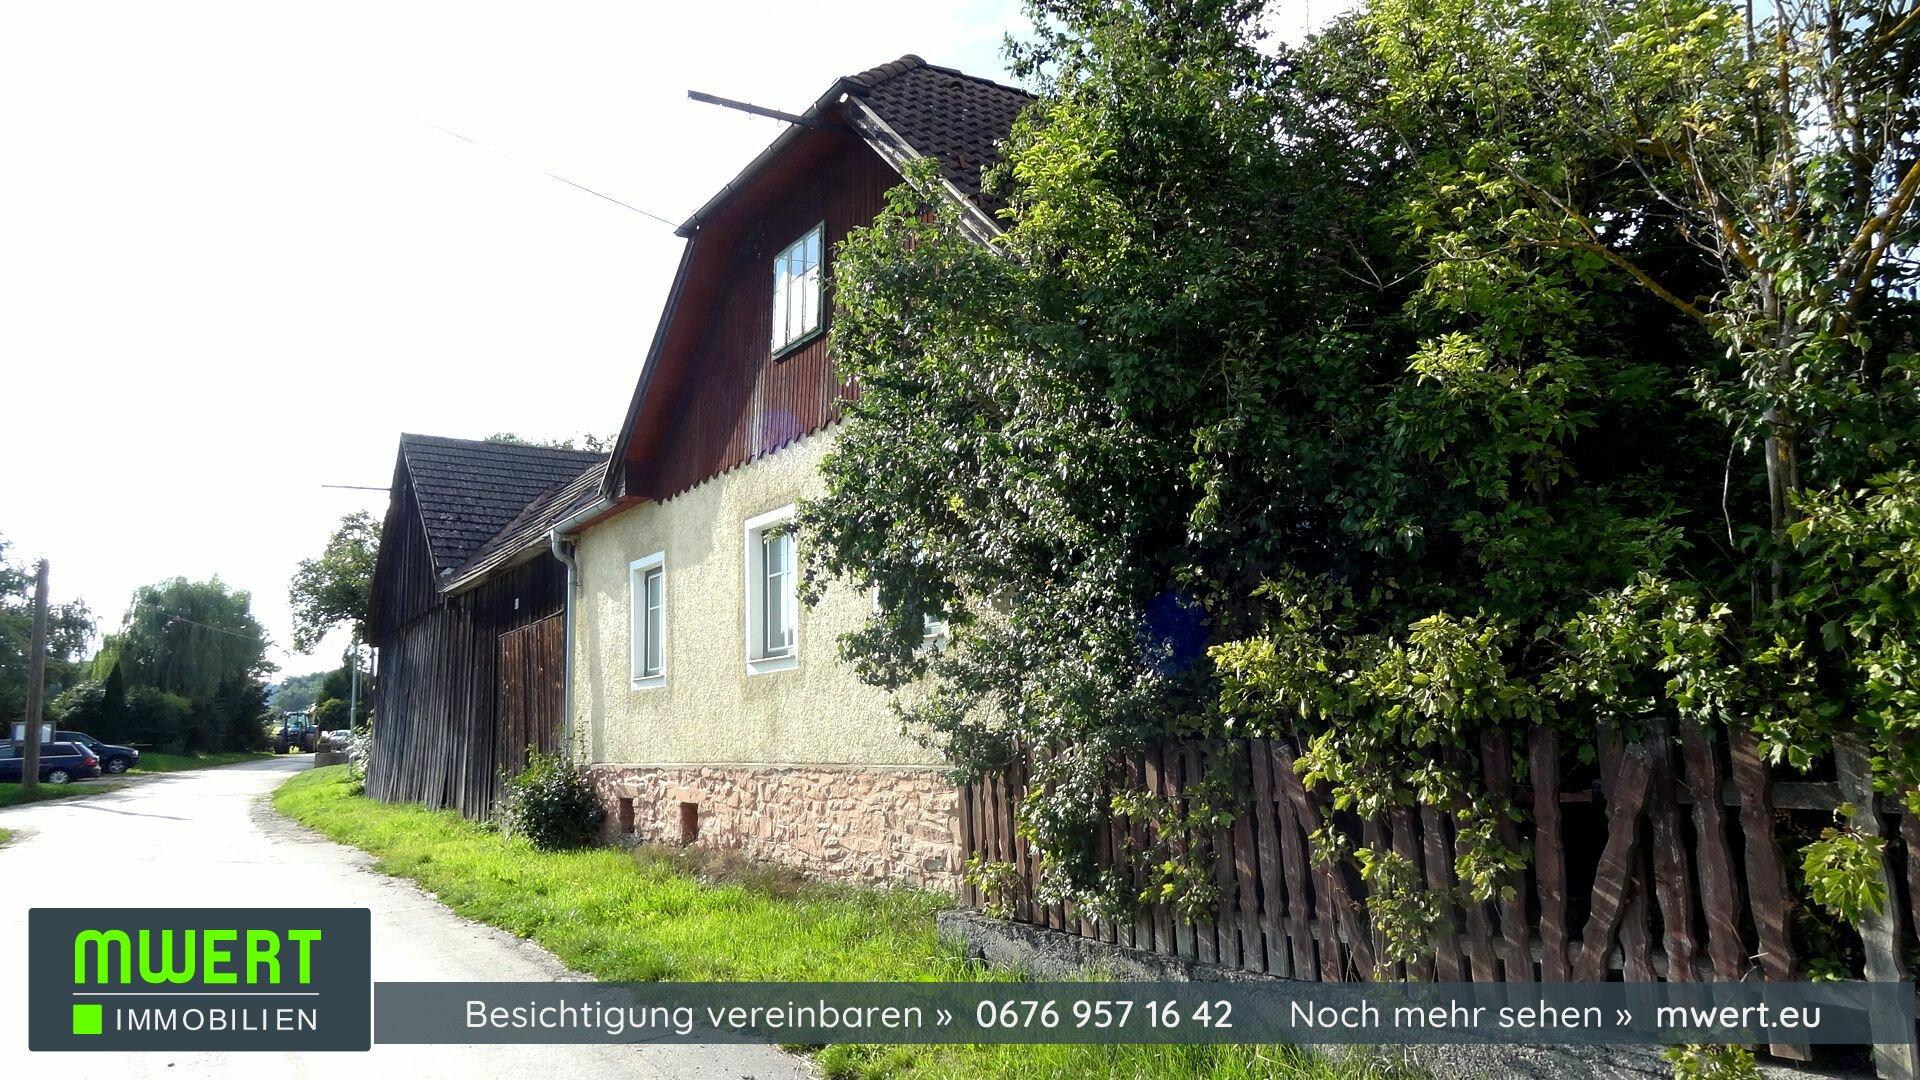 Haus im Waldviertel, Krems, Dankholz